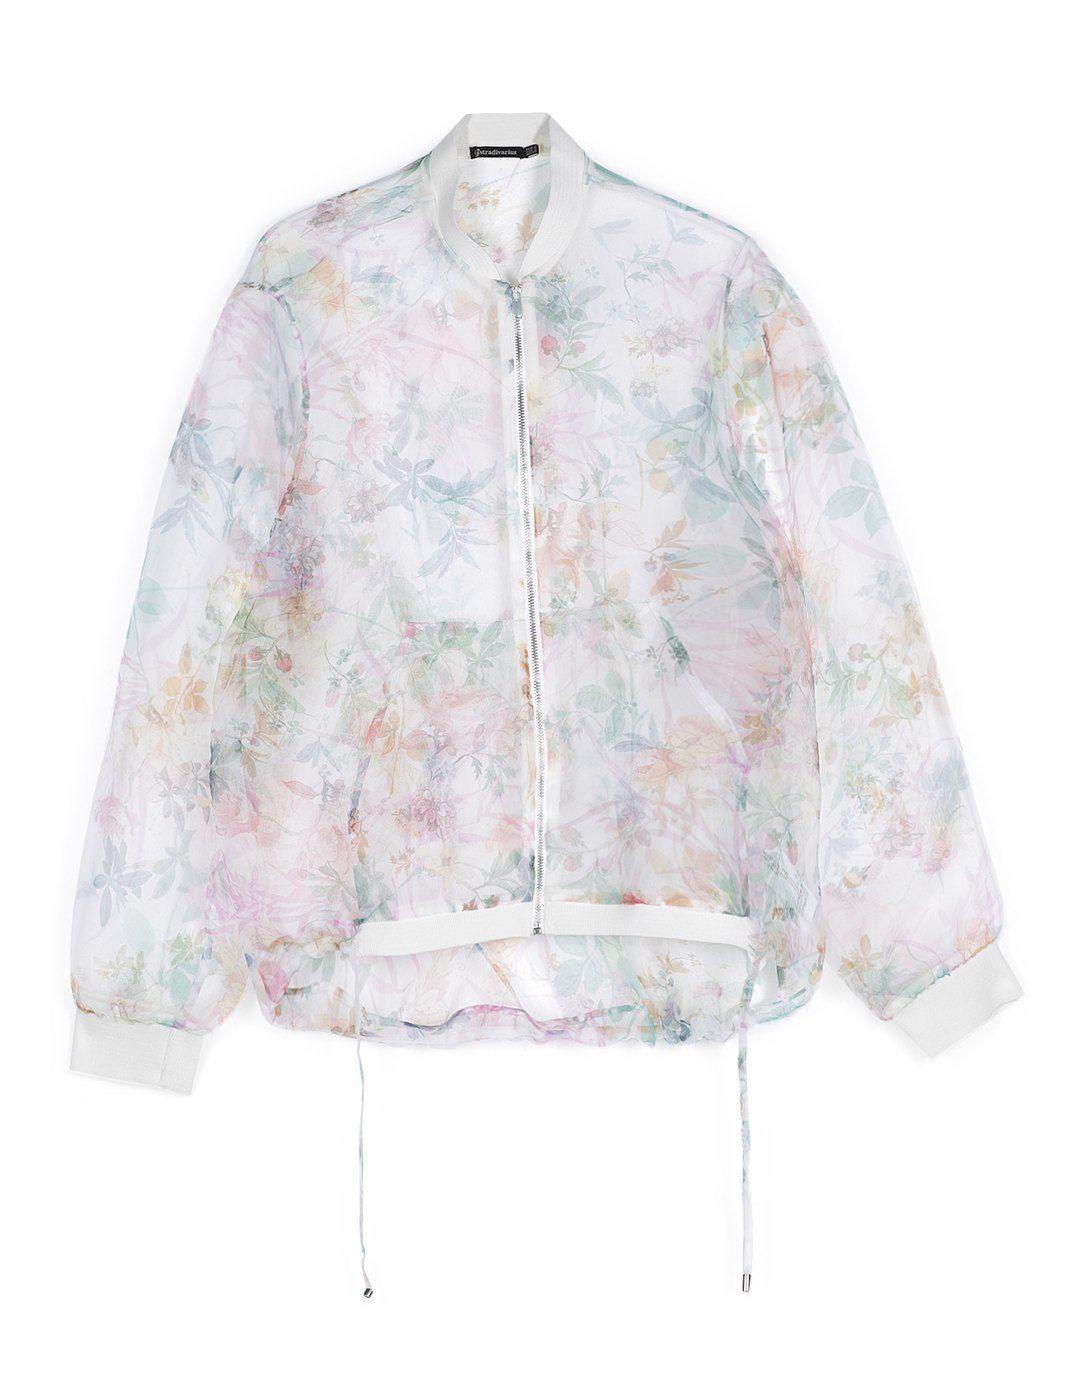 New Womens Summer Floral Print Long Sleeve Bomber Jacket Organza Sunblock Coat